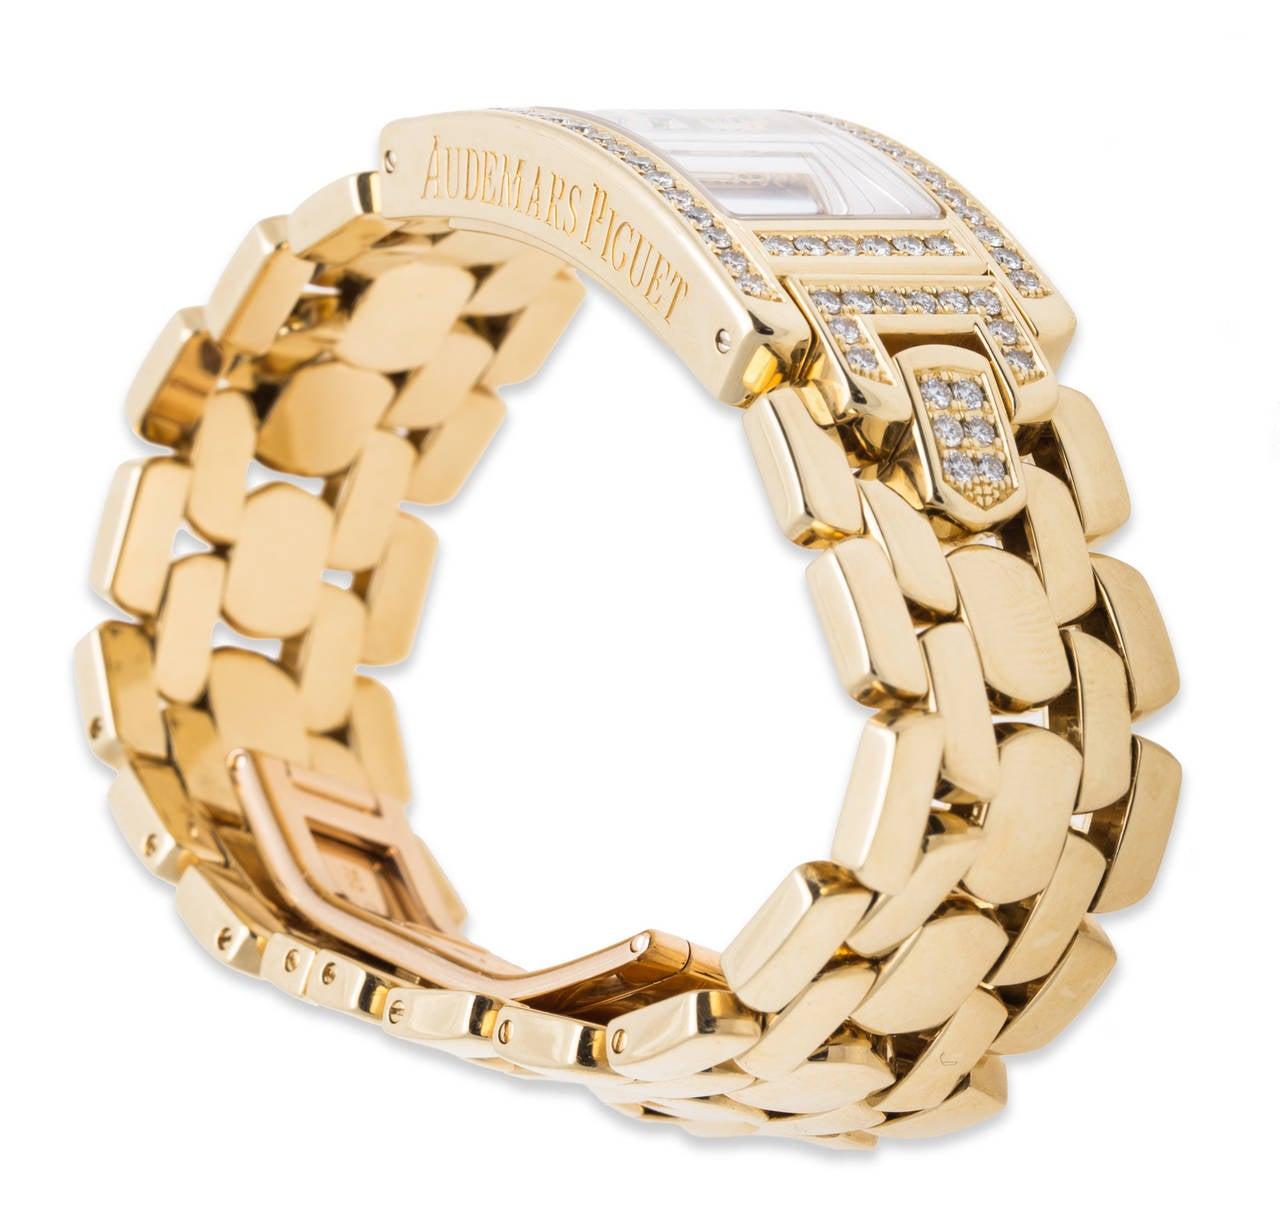 Audemars Piguet Ladies Yellow Gold and Diamond Promesse Quartz Wristwatch 4